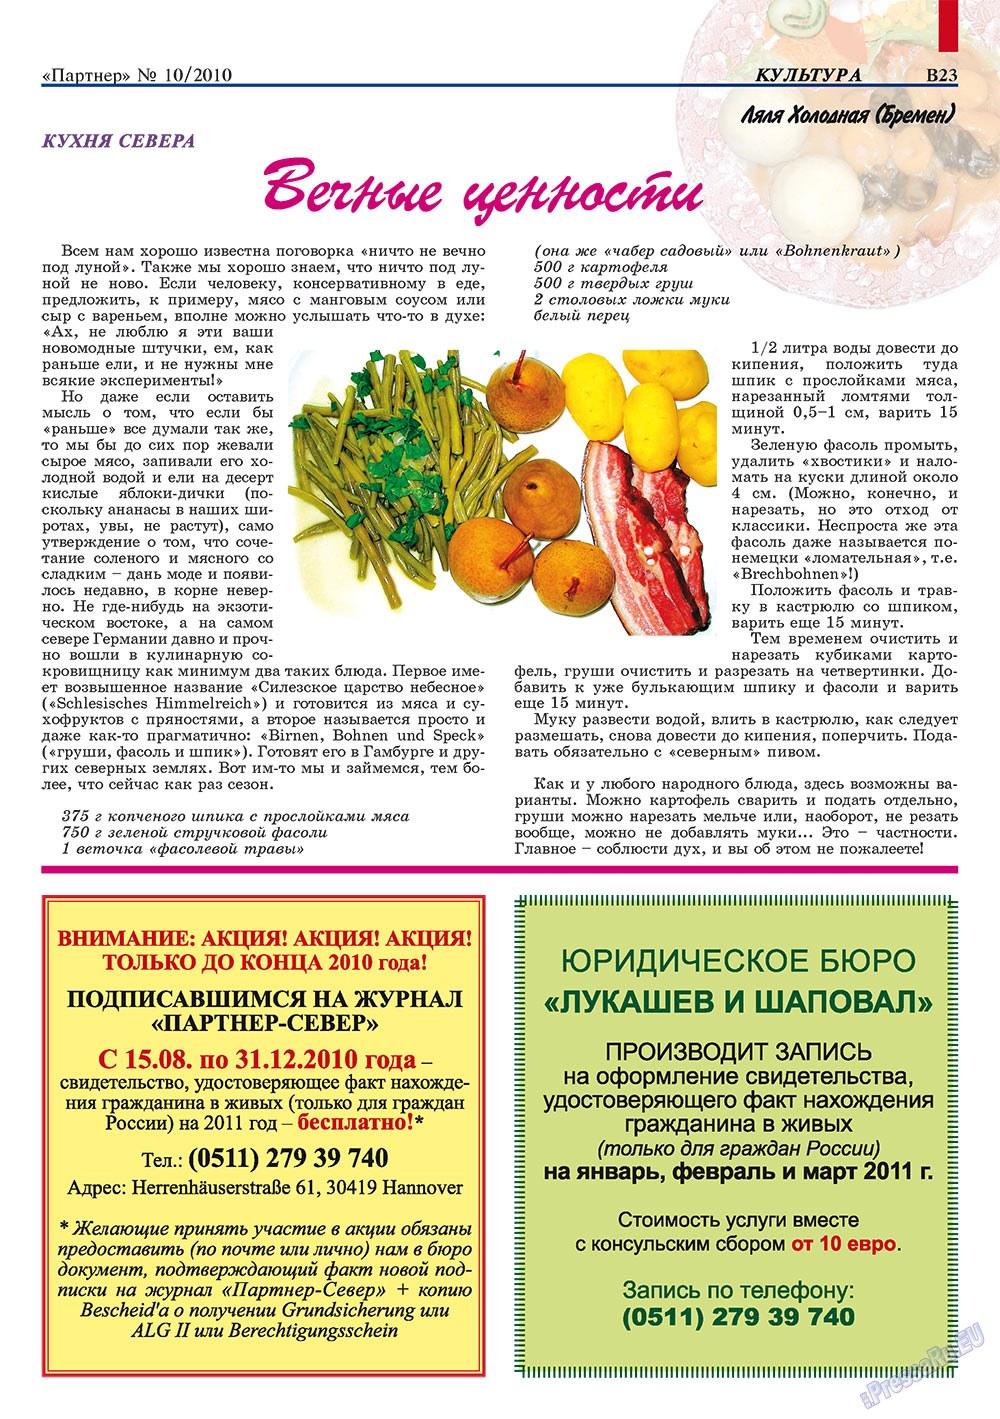 Партнер-север (журнал). 2010 год, номер 10, стр. 33